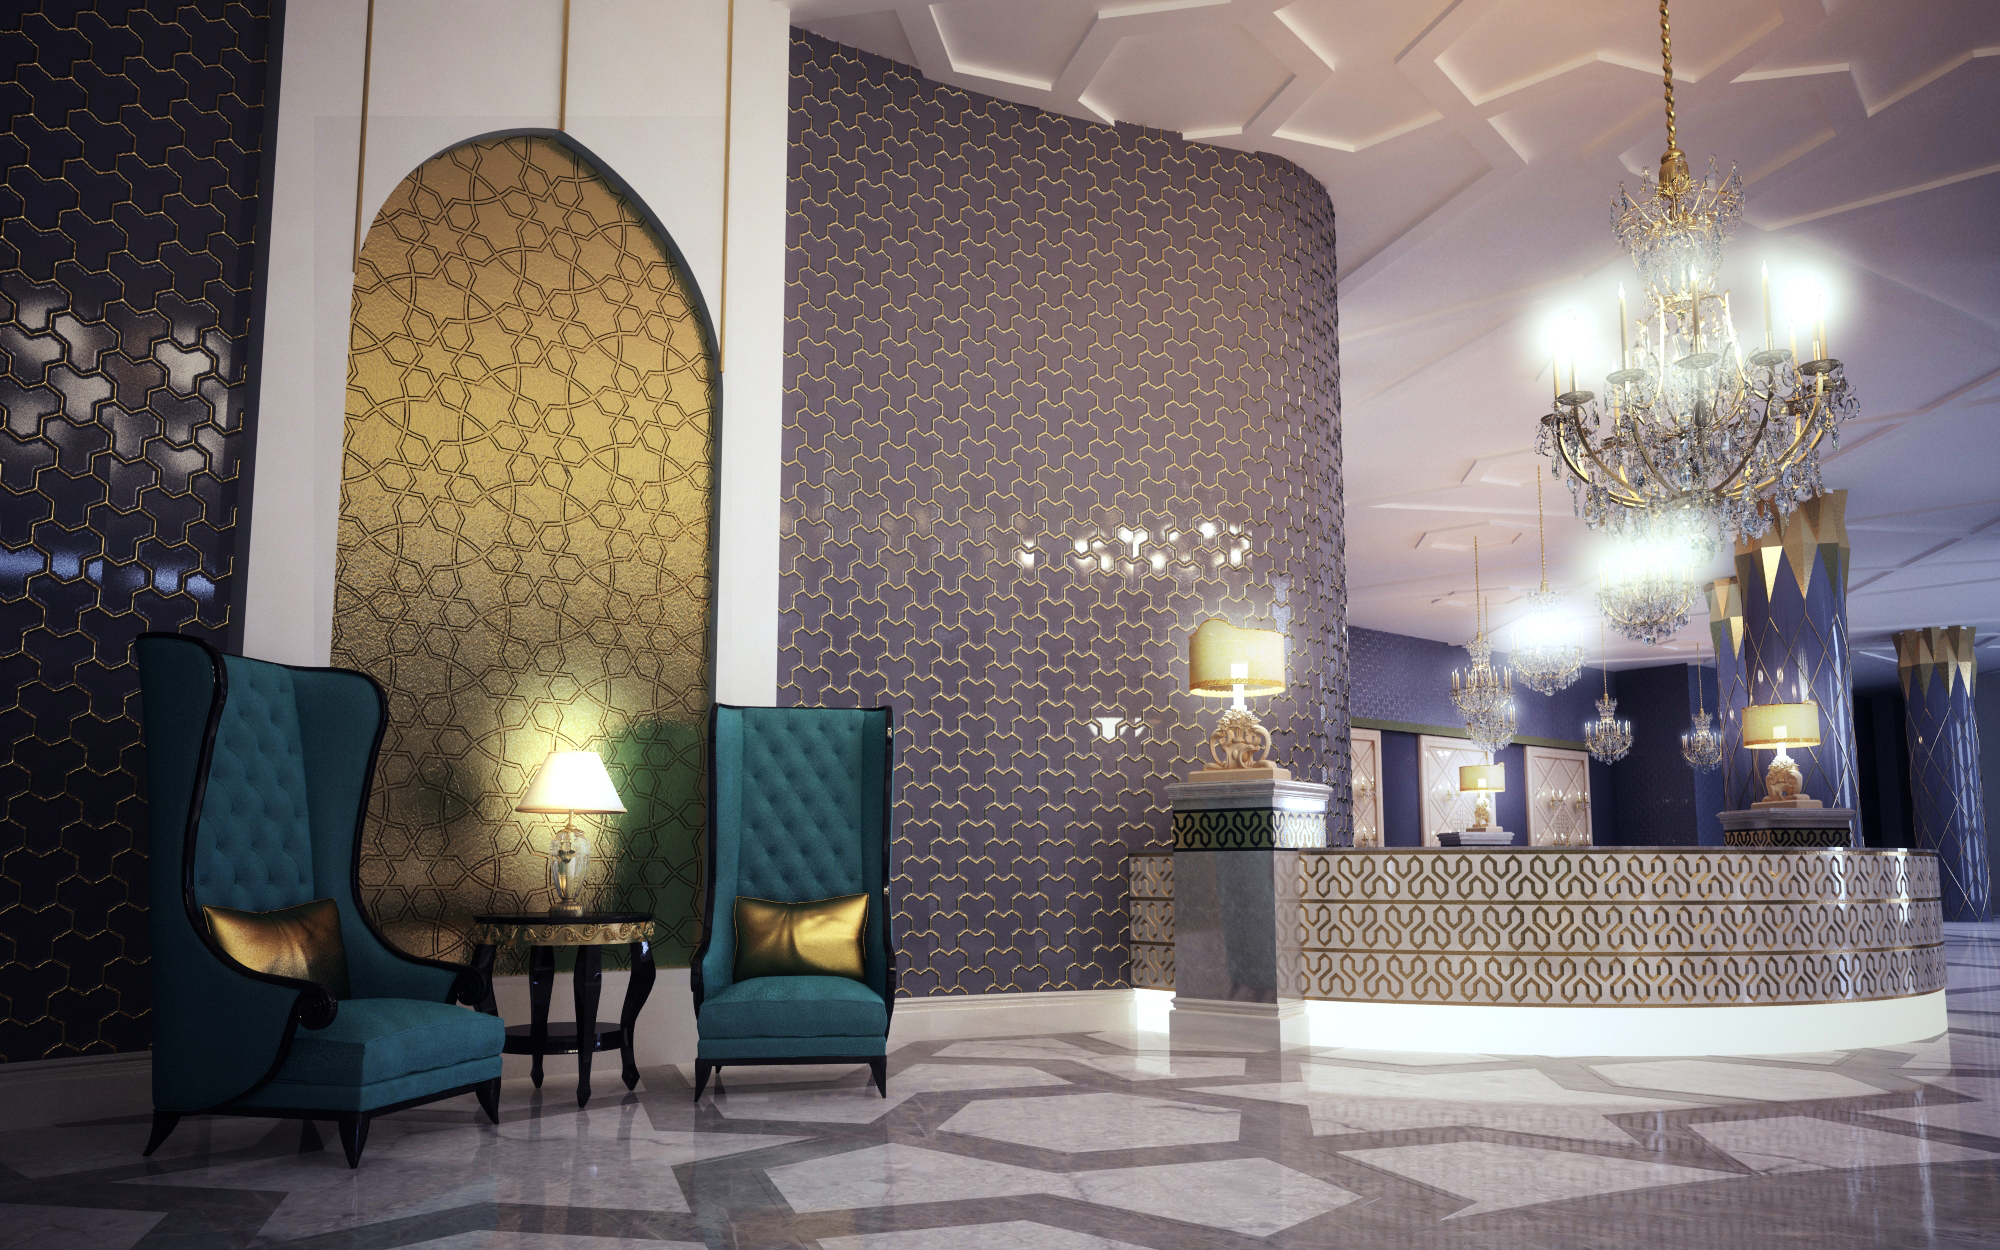 Burk Hotel Lobby 02 By Murataral On Deviantart